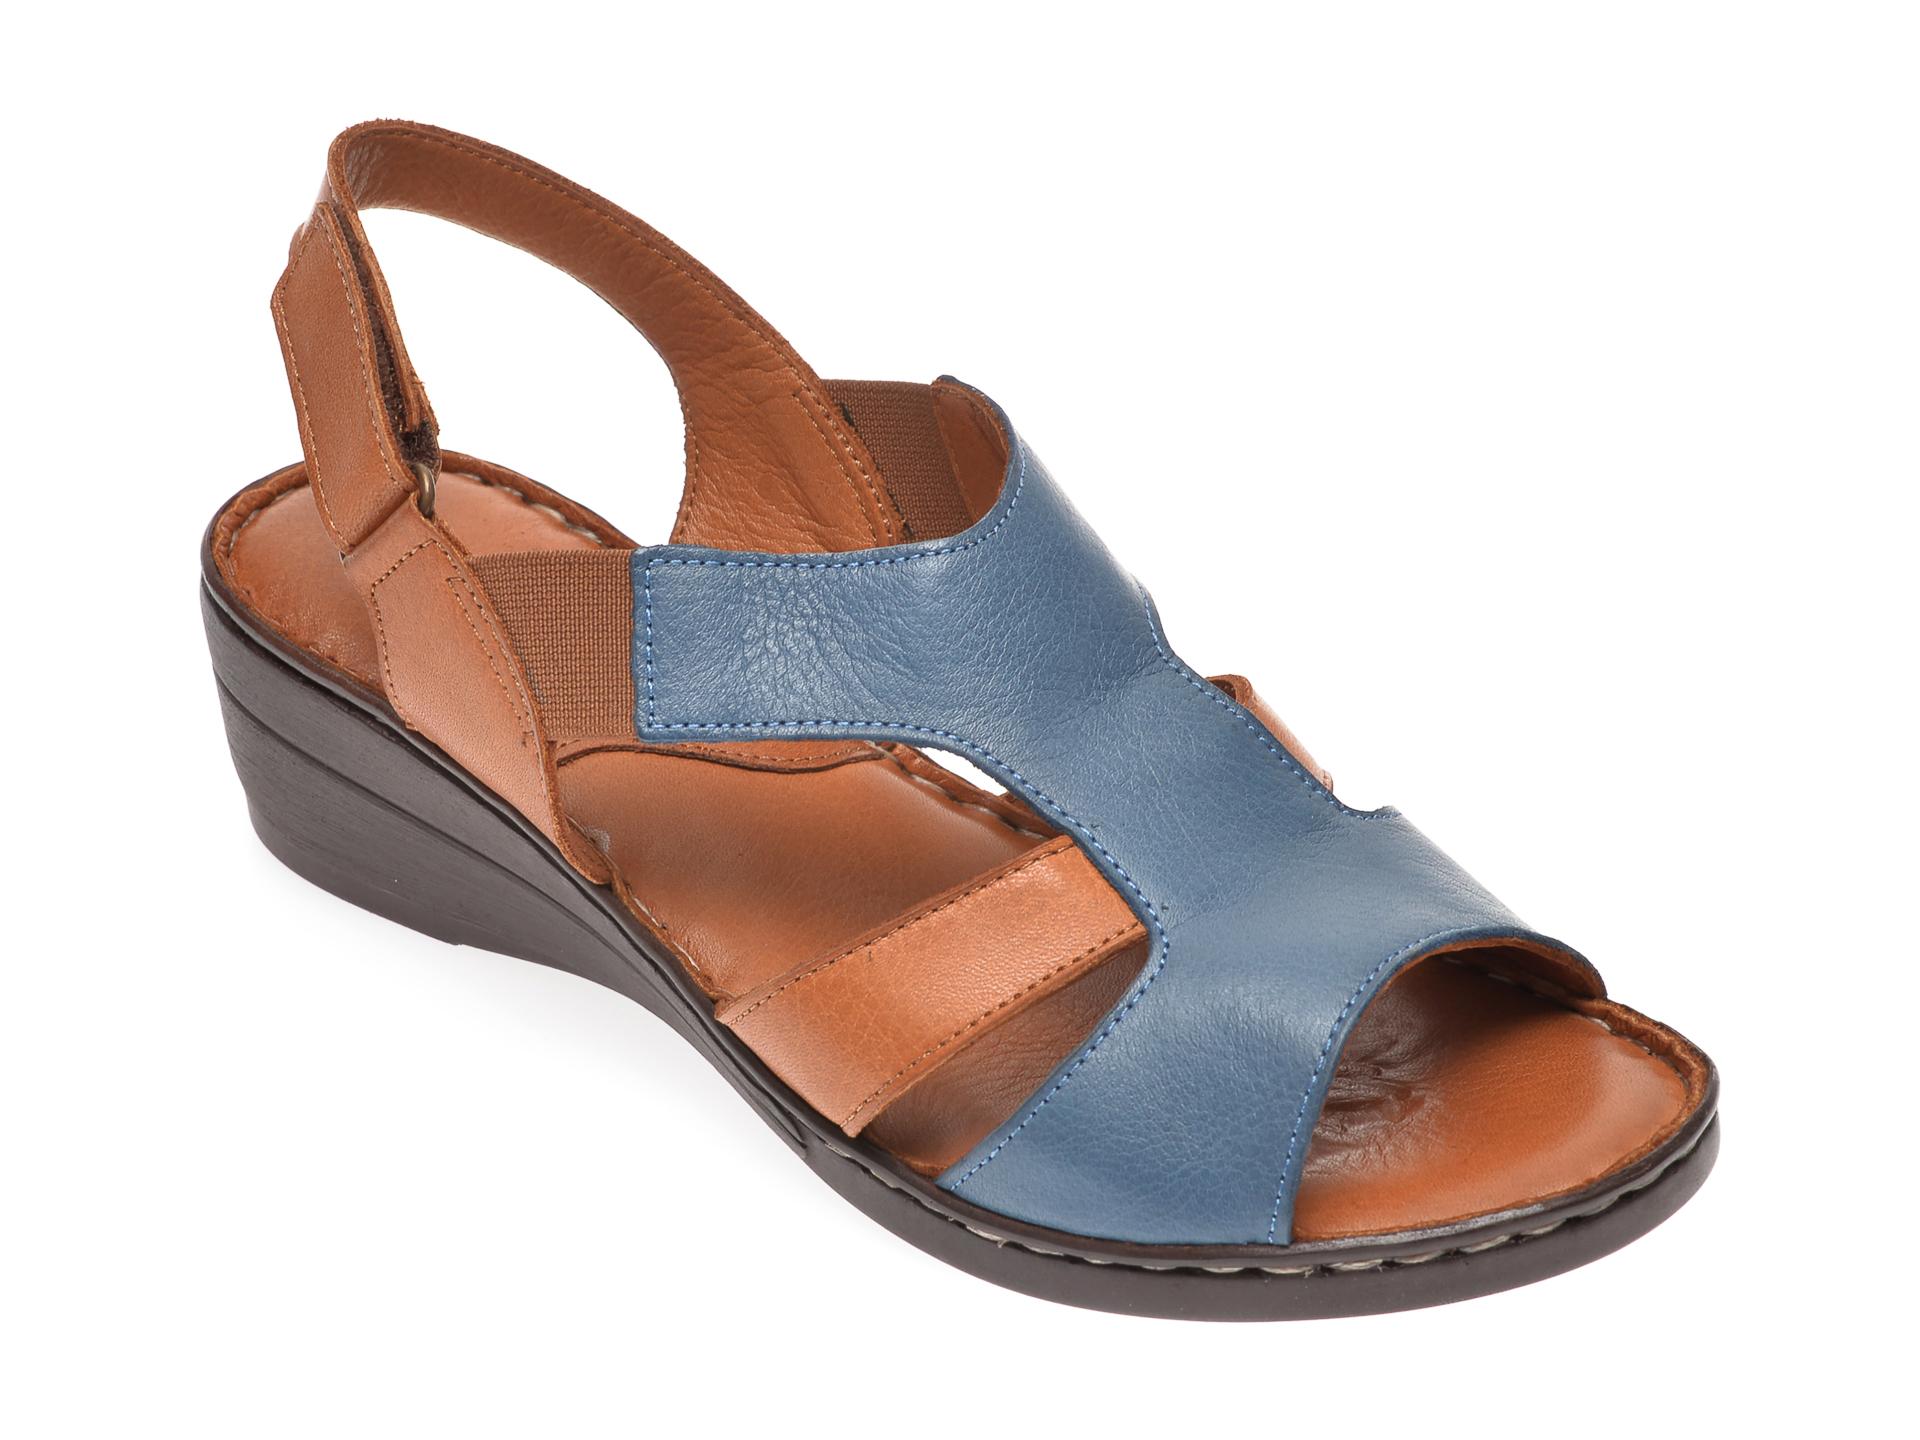 Sandale PASS COLLECTION albastre, 411, din piele naturala